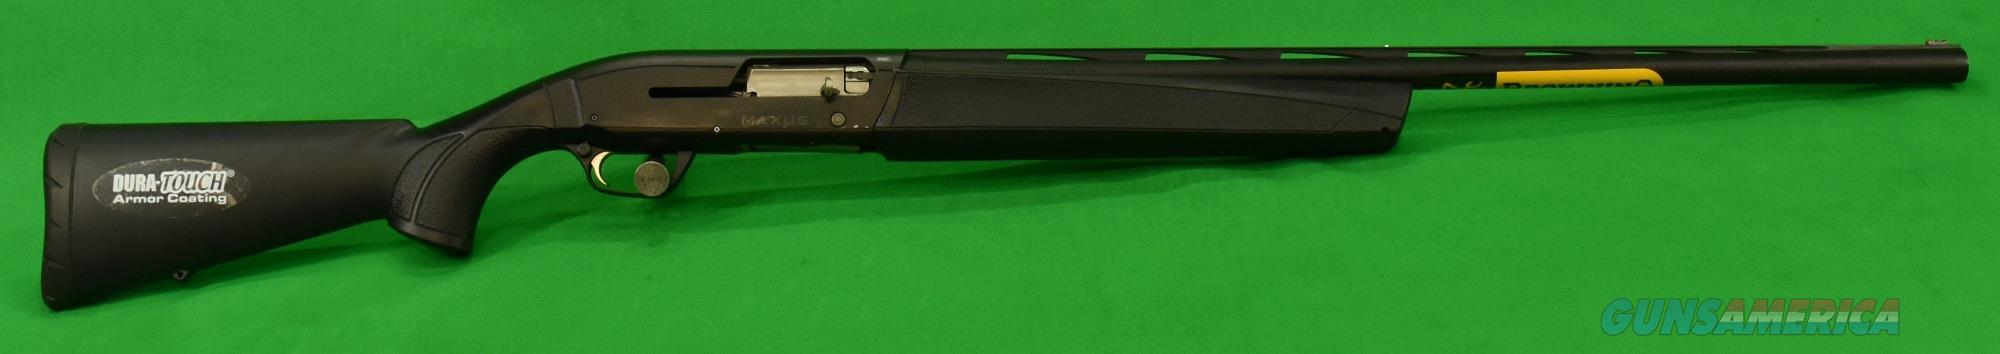 Maxus Stalker Black 12Ga 28-3.5In 011600204  Guns > Shotguns > Browning Shotguns > Autoloaders > Hunting